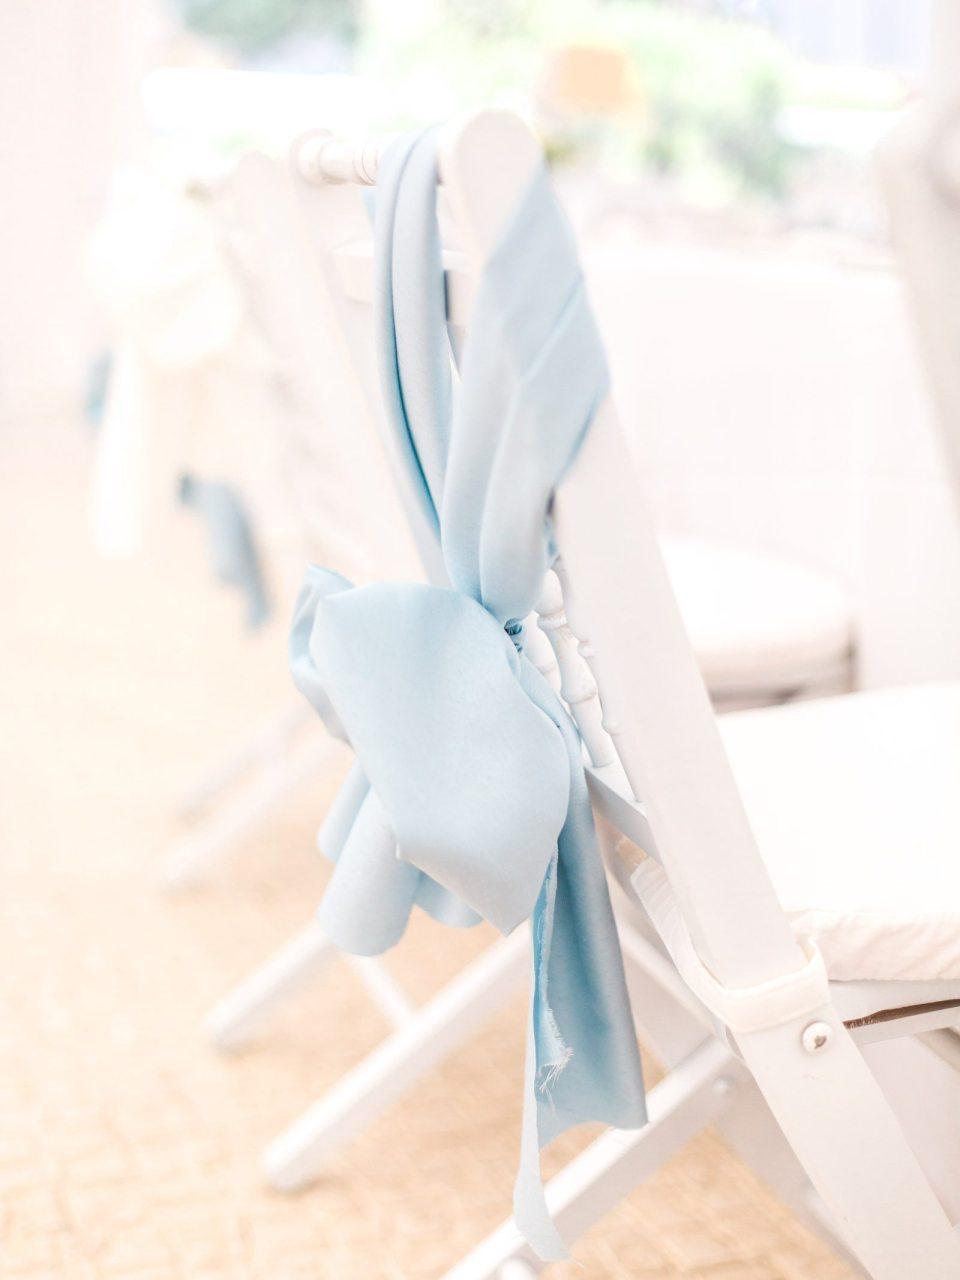 Os Agostos Algarve Wedding | Married Morenos